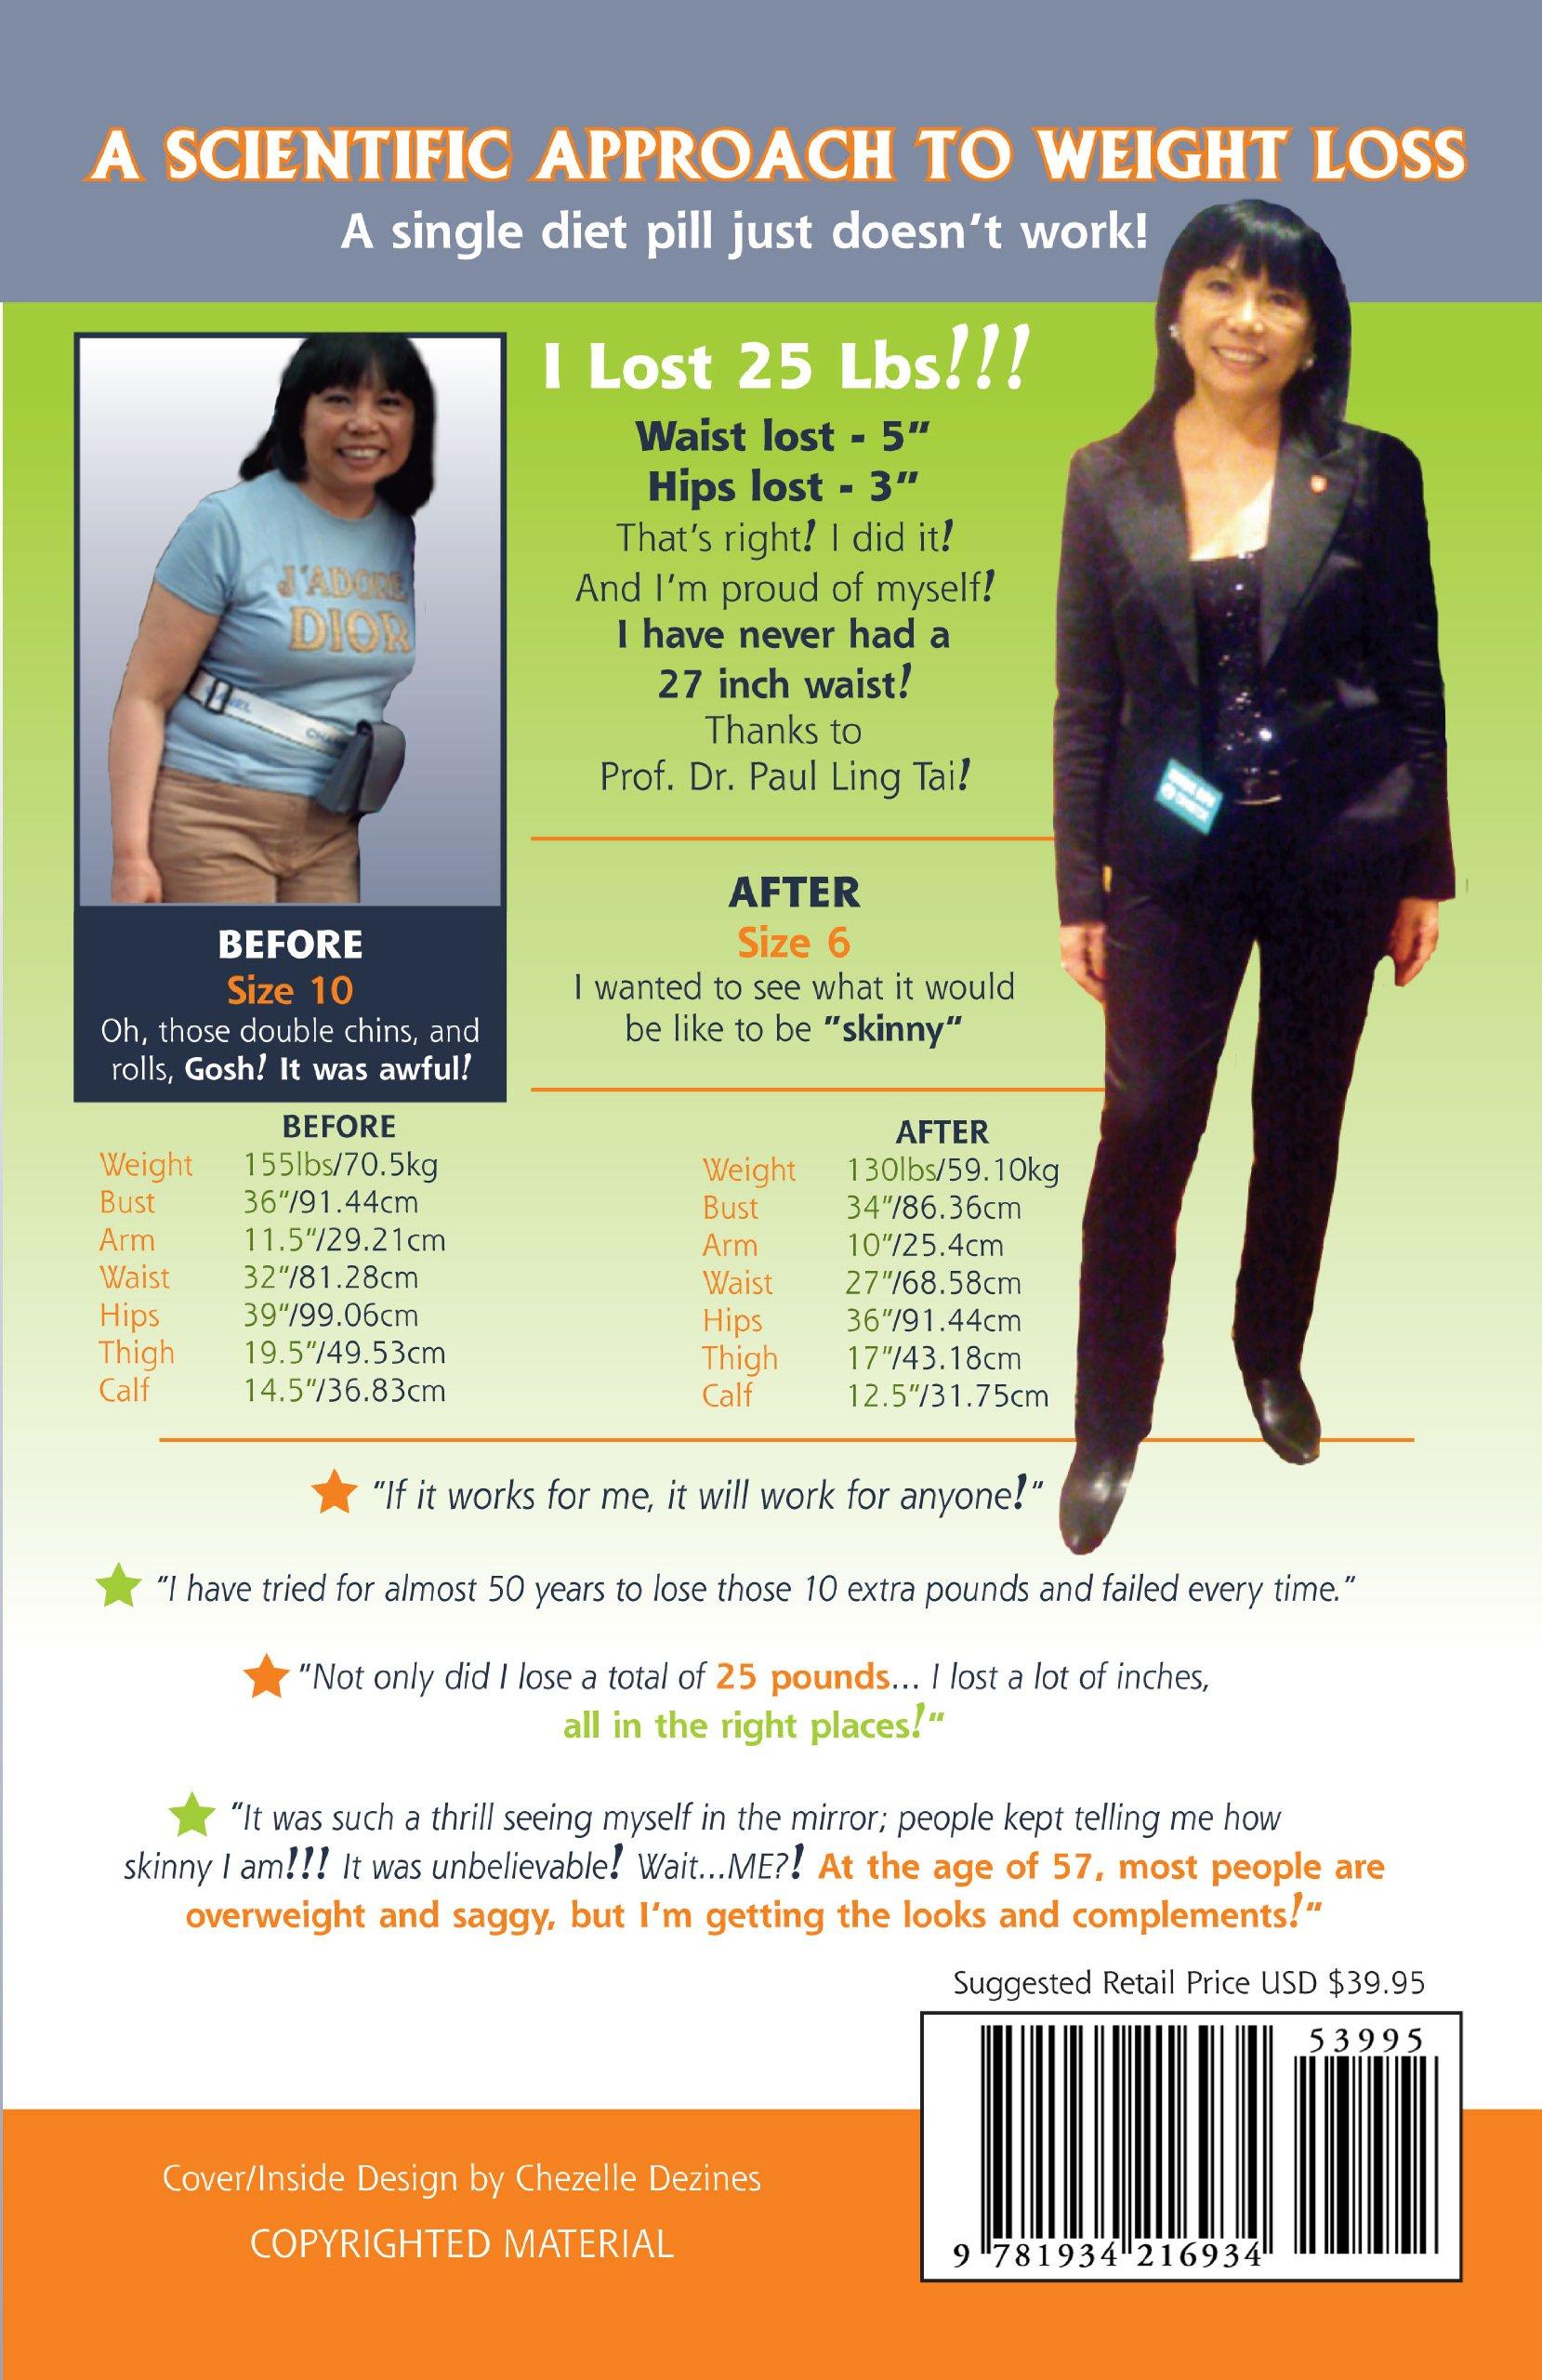 the thin factors a super weight loss program prof dr paul ling